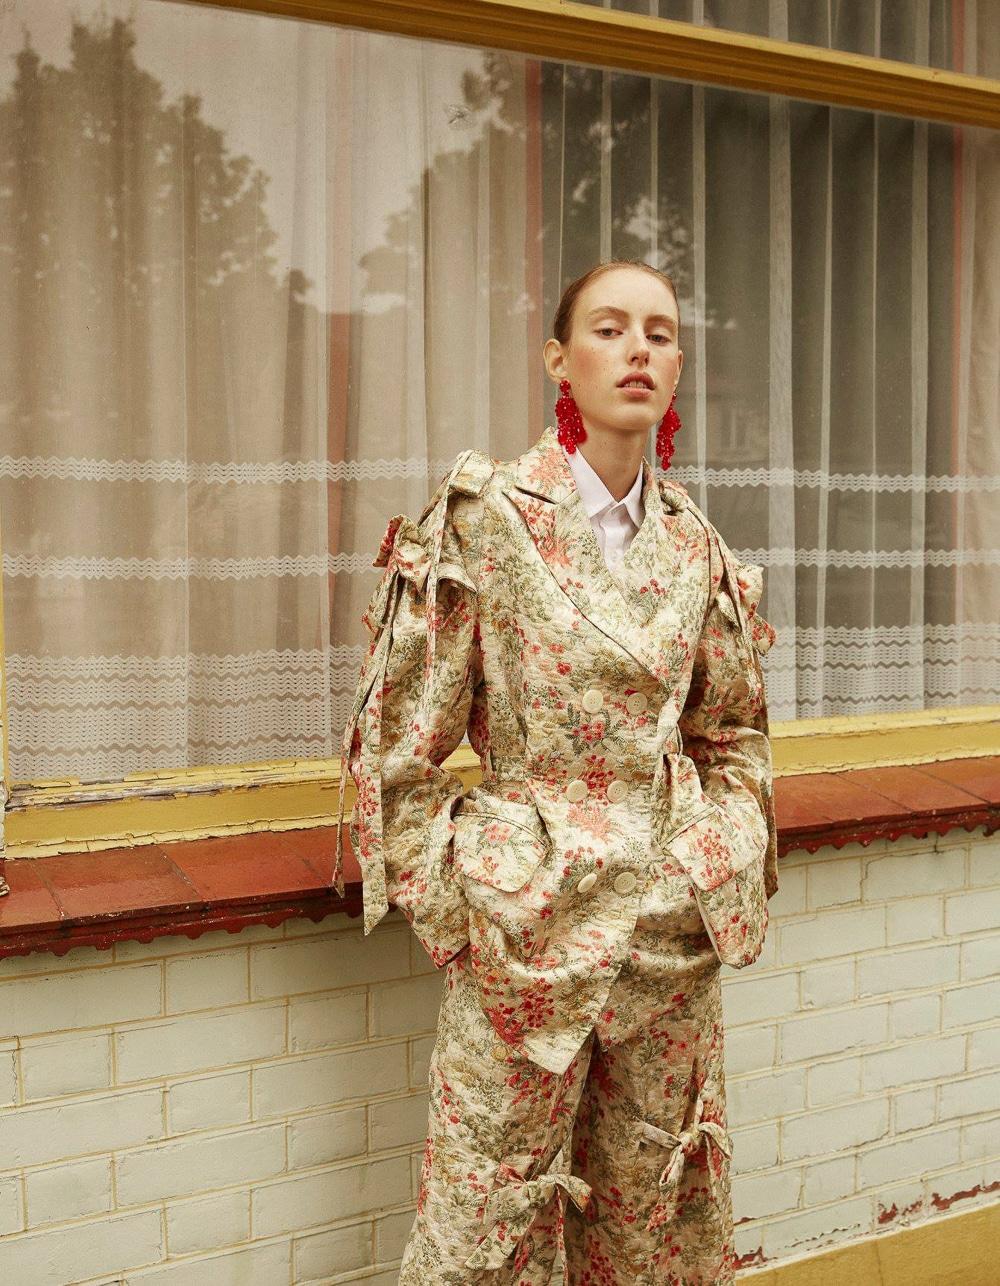 Ina-Lekiewicz-Vogue-Poland-Pia-Priewe-10.jpg